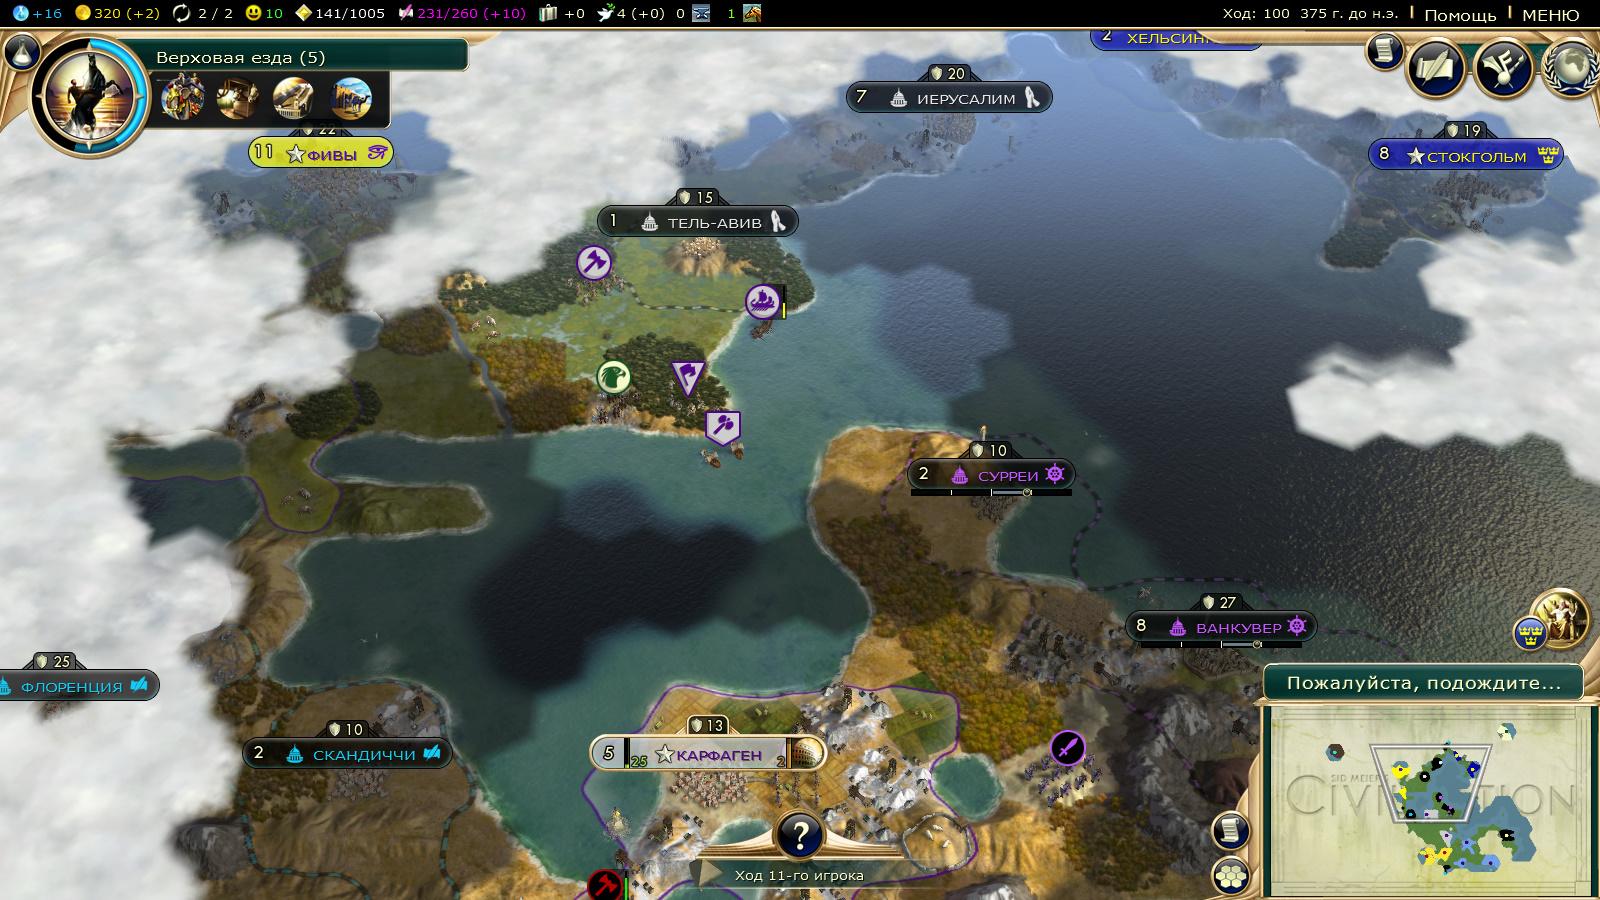 Британская Колумбия, Флоренция и Израиль - Sid Meier's Civilization 5 Моды